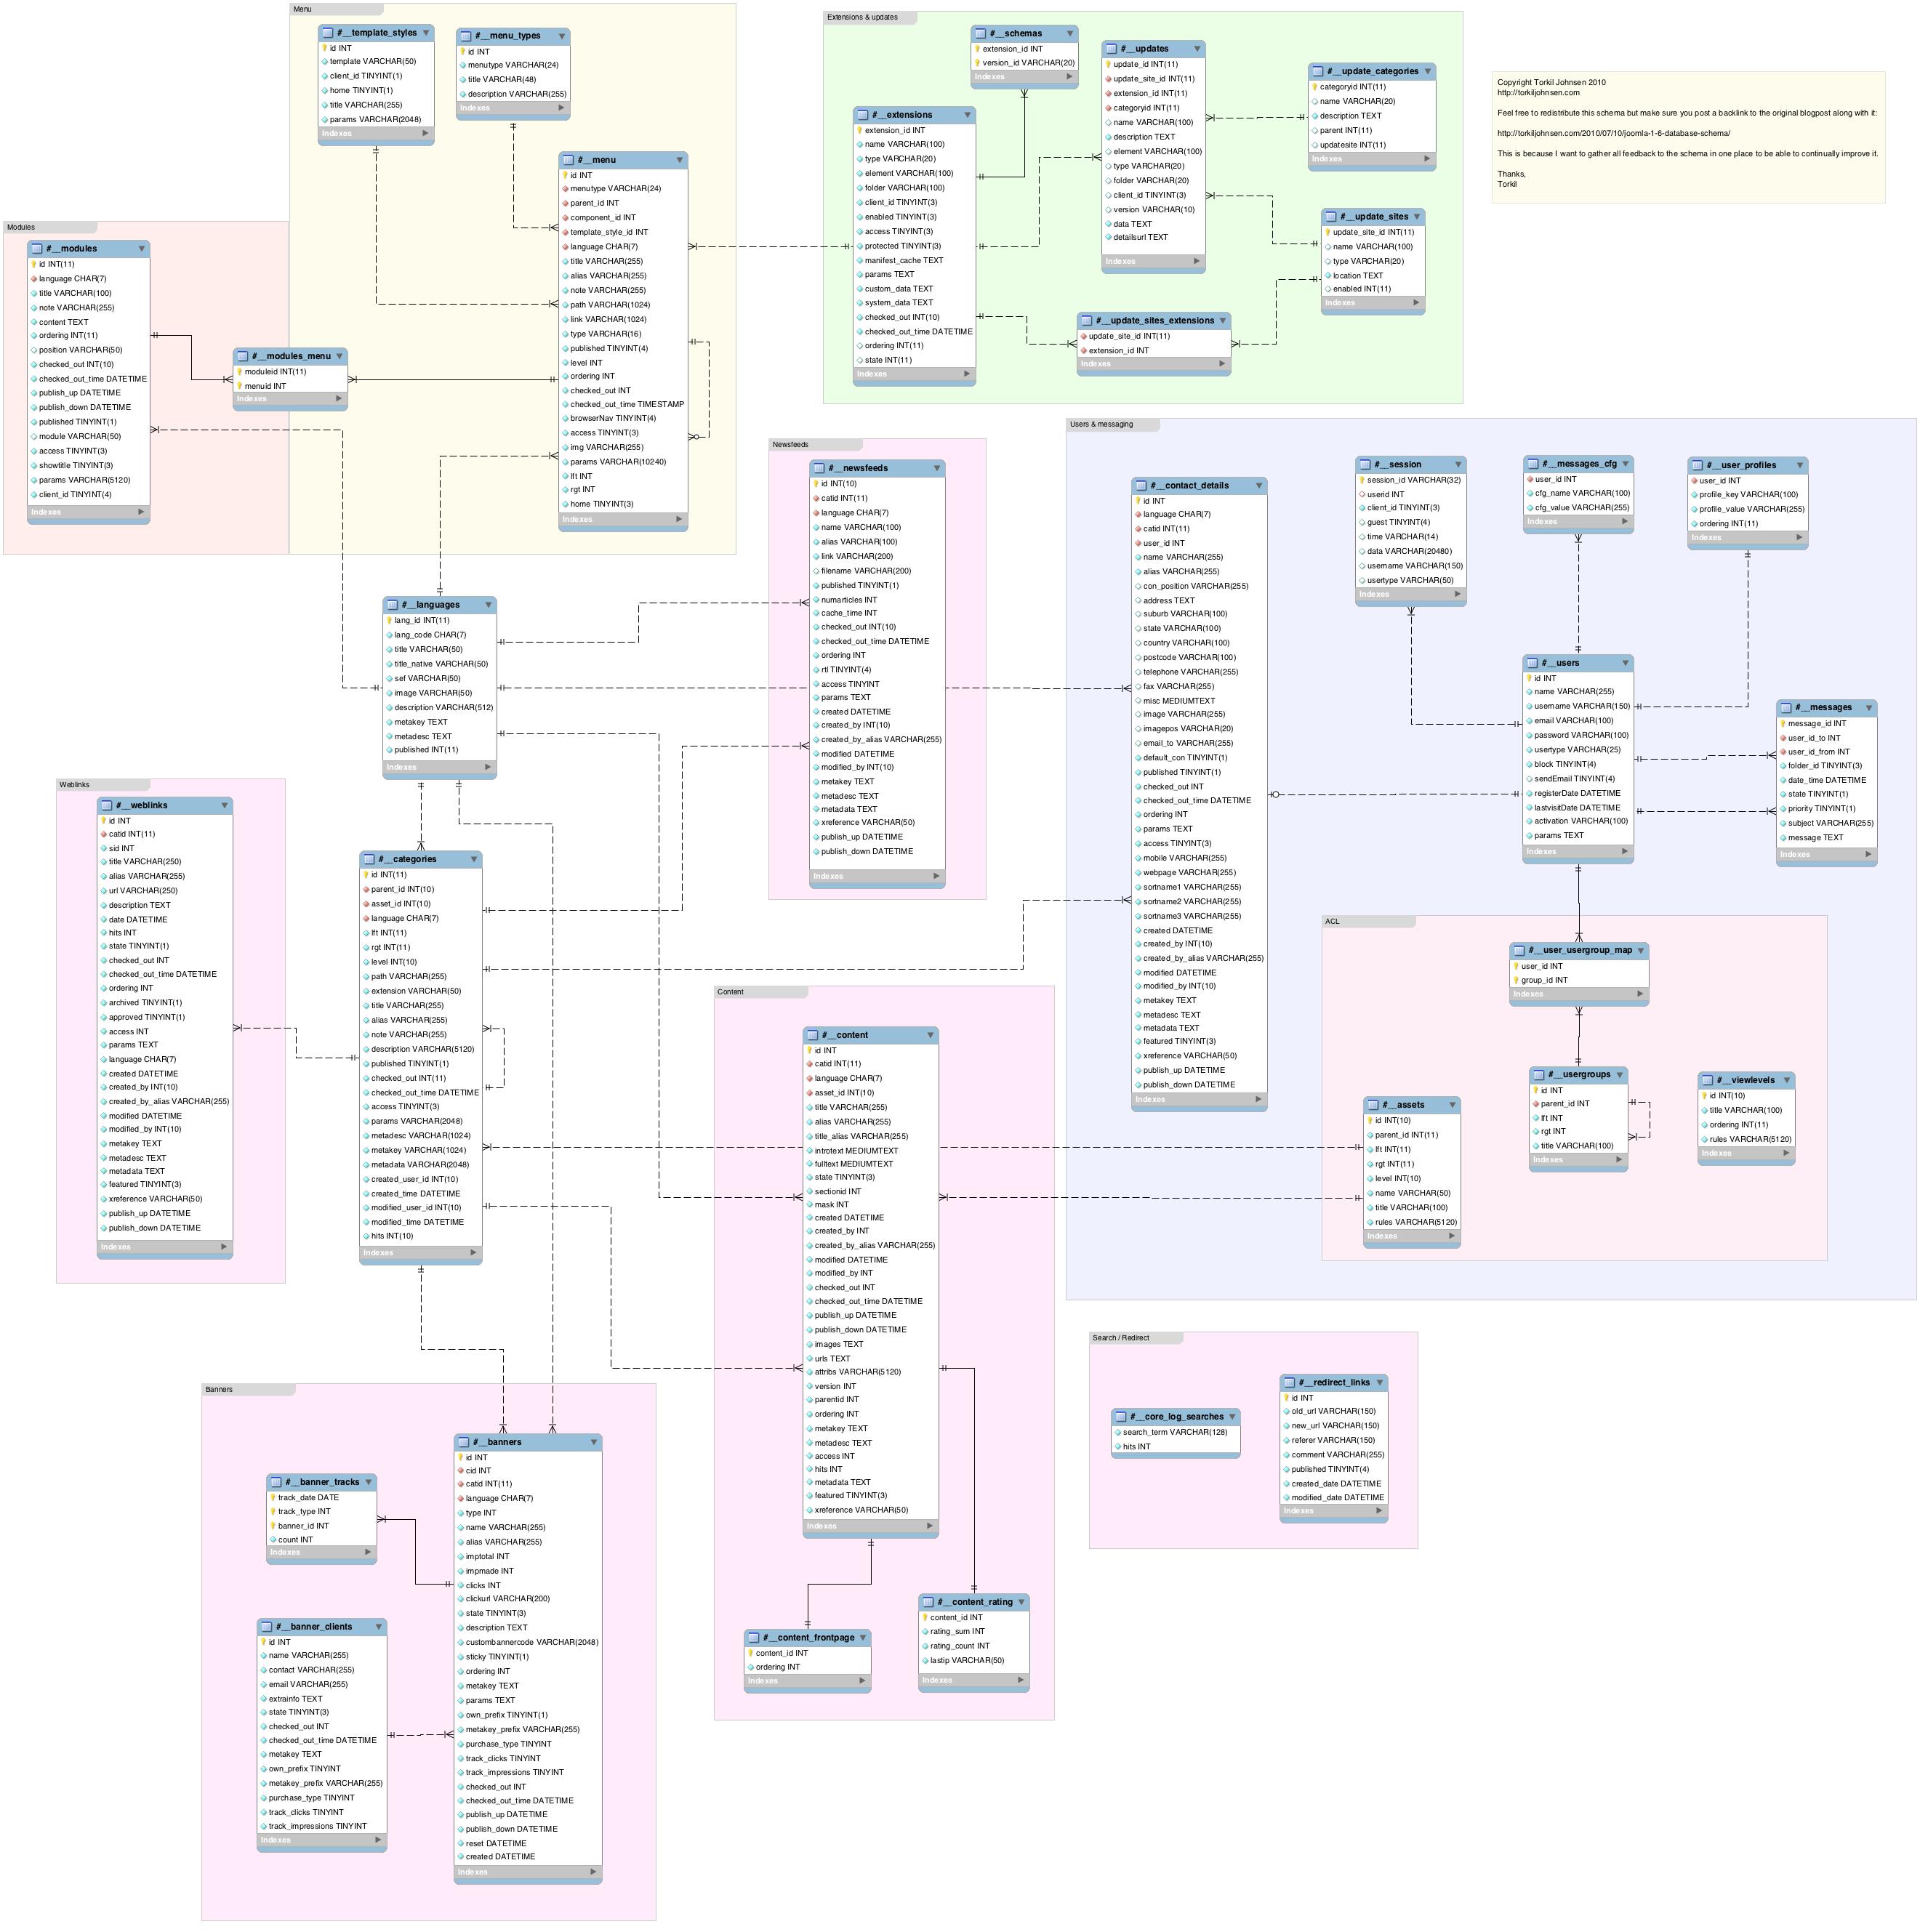 reference xml schema create professional resumes online for free - Online Db Schema